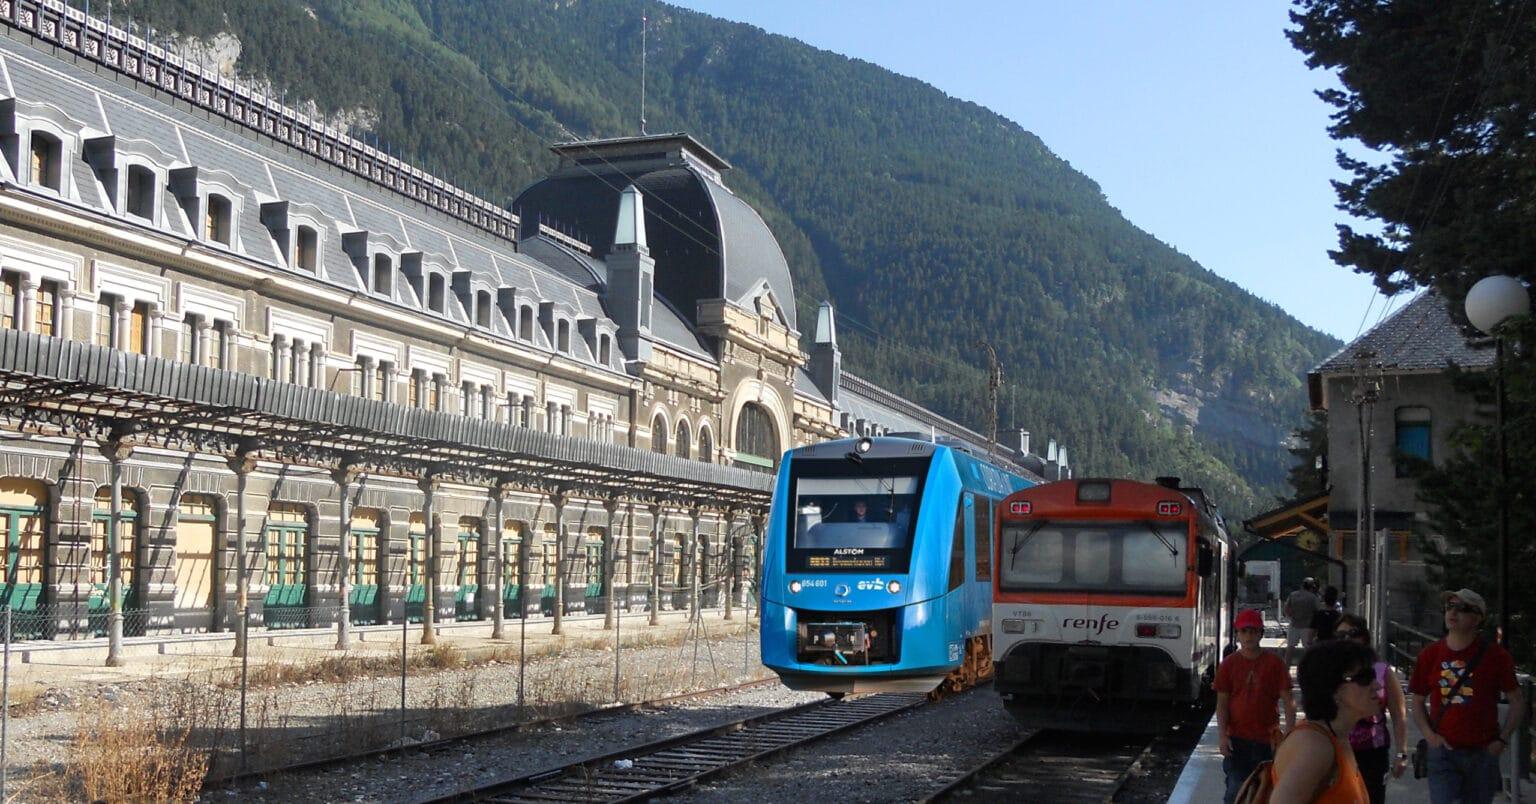 Montaje de un Coradia iLint en Canfranc. Foto de la estación: McBodes. Foto del tren: Jacek Rużyczka